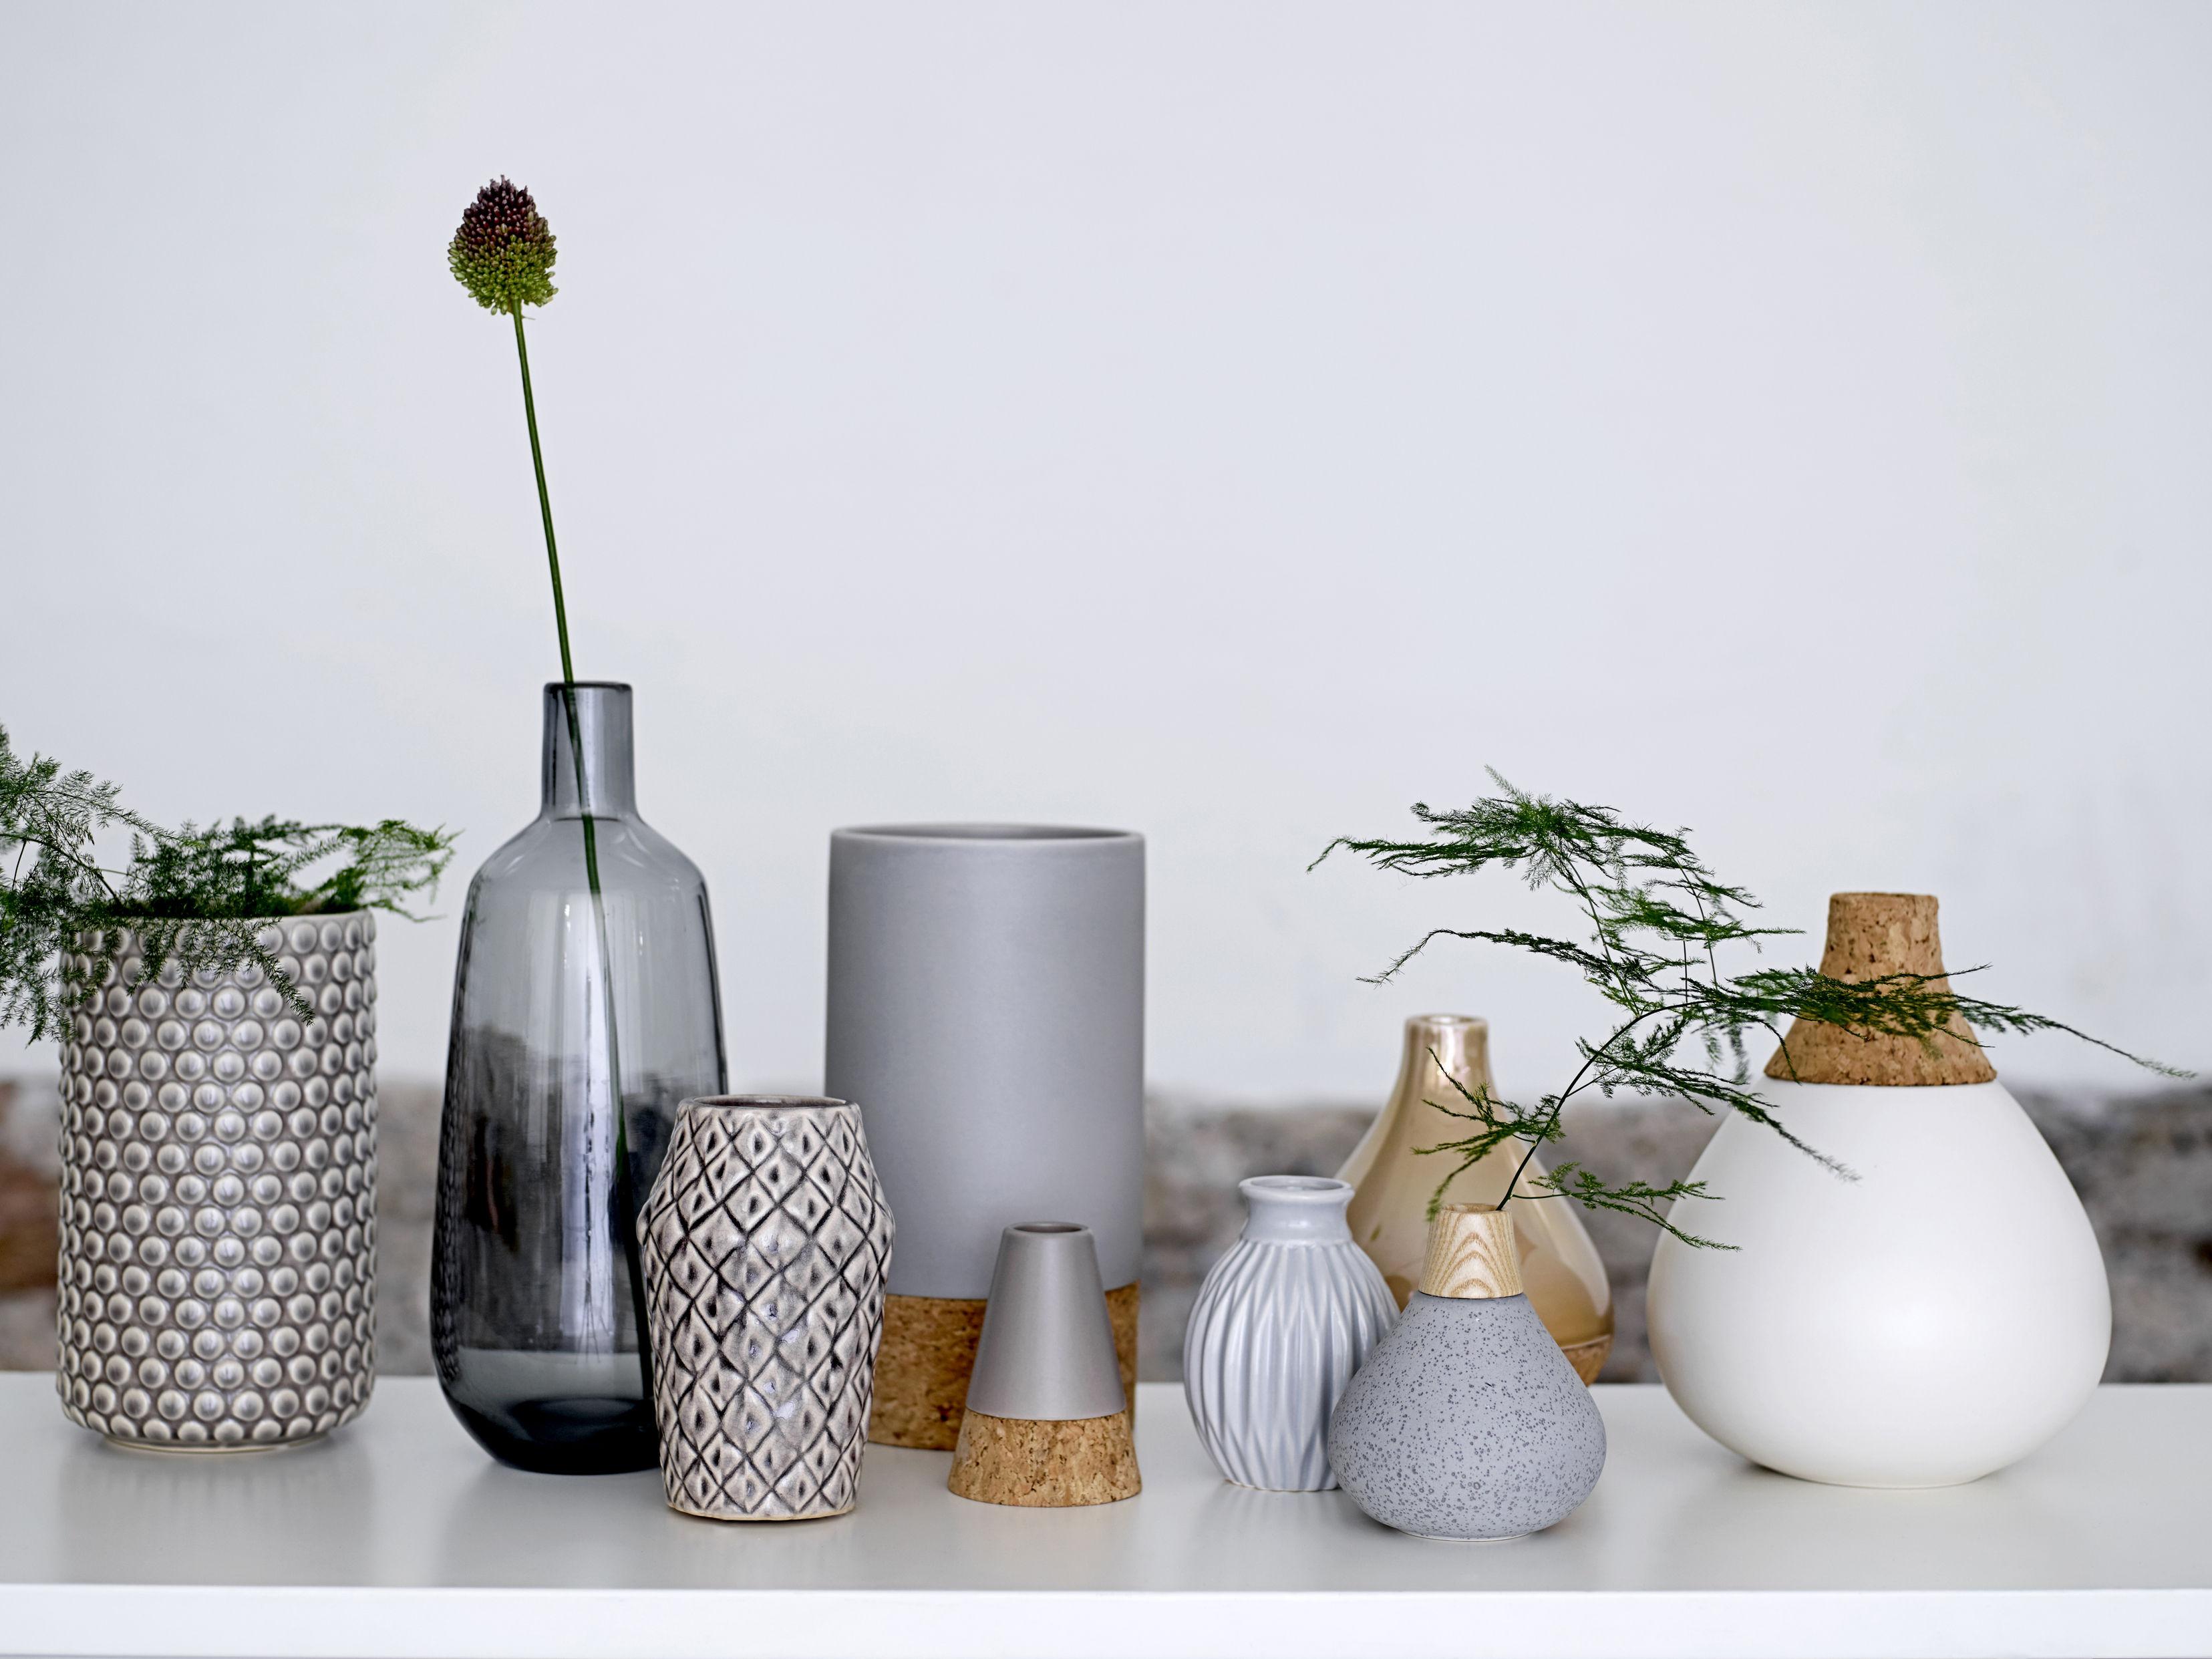 Vase Keramik Und Kork O 18 Cm X H 22 Cm Bloomingville